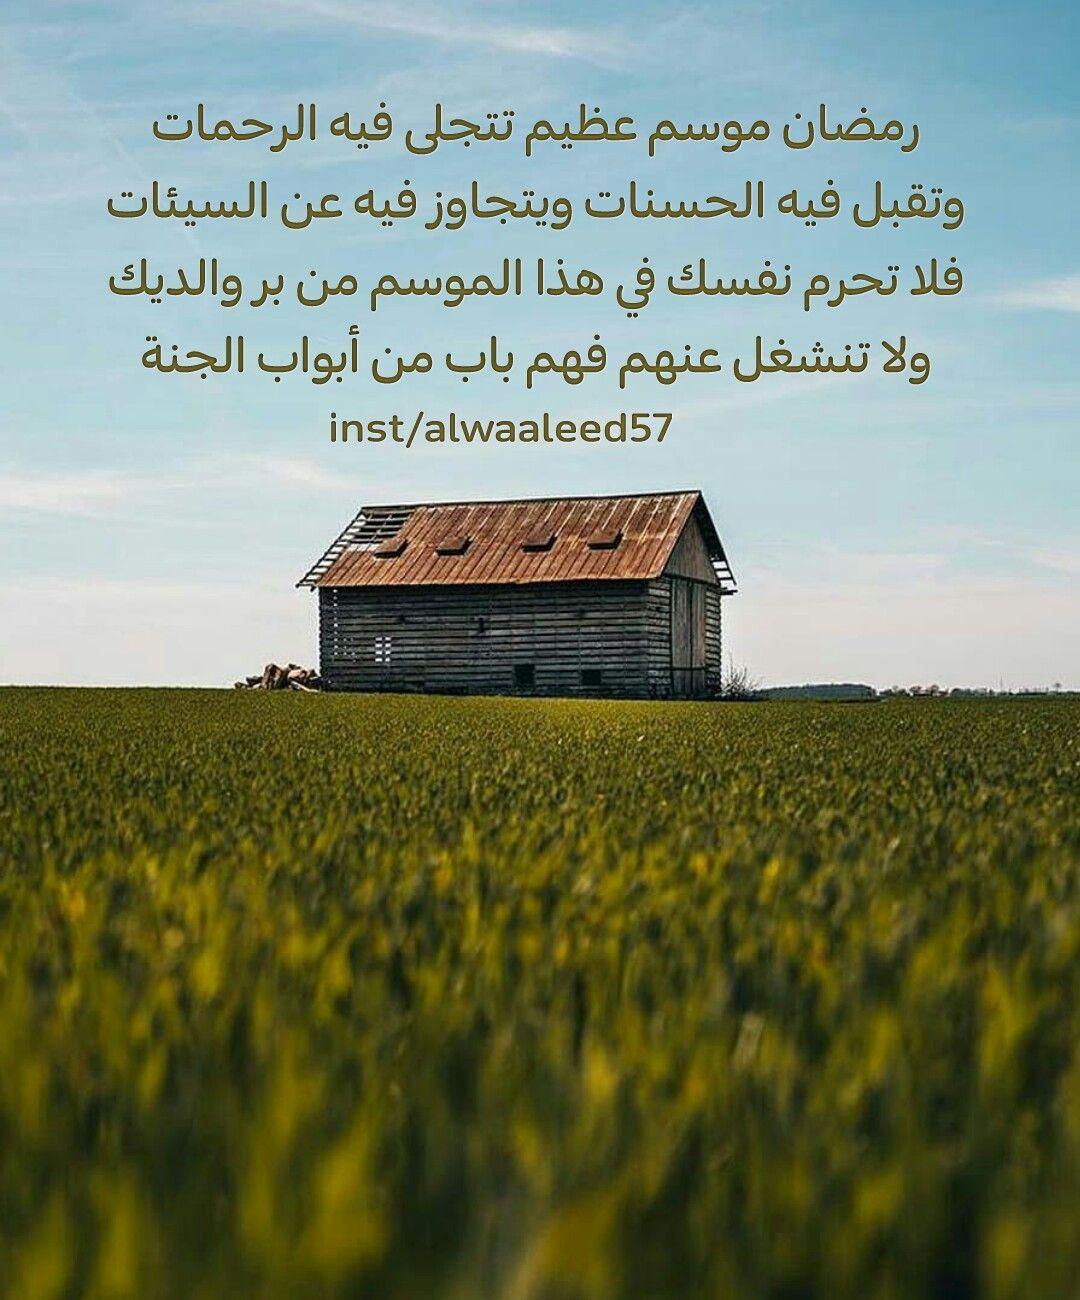 Pin By Um Ahmad On عبارات ومواعظ House Styles Home Decor Style